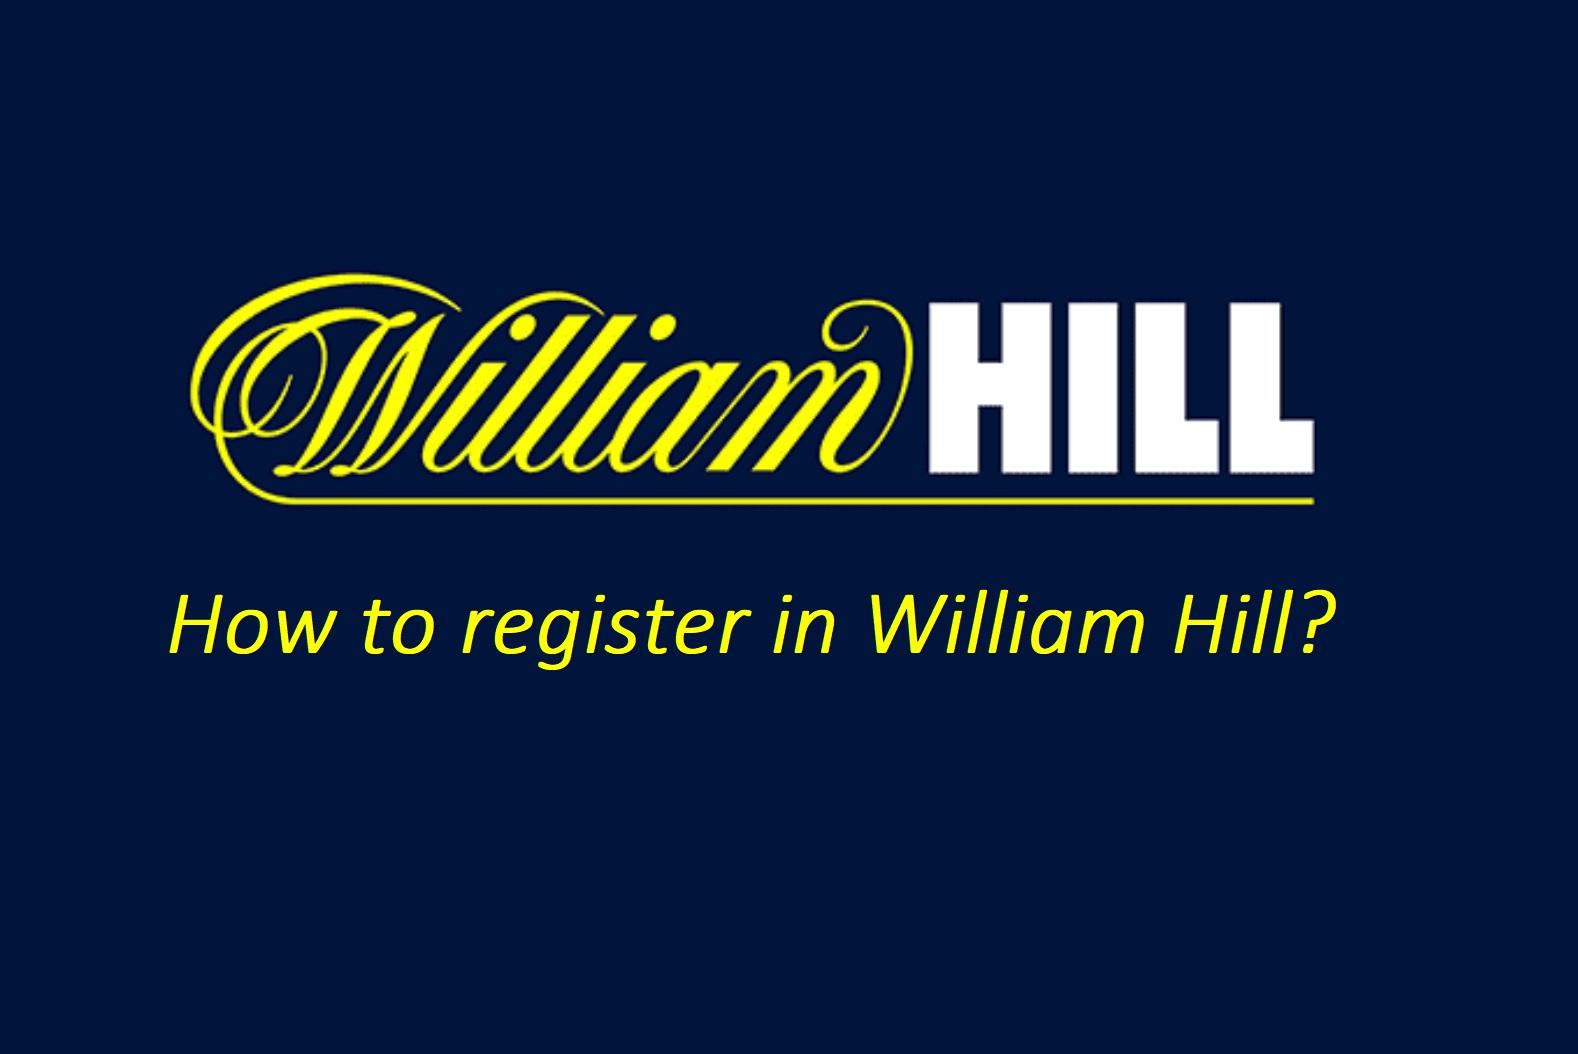 William Hill registration sign up